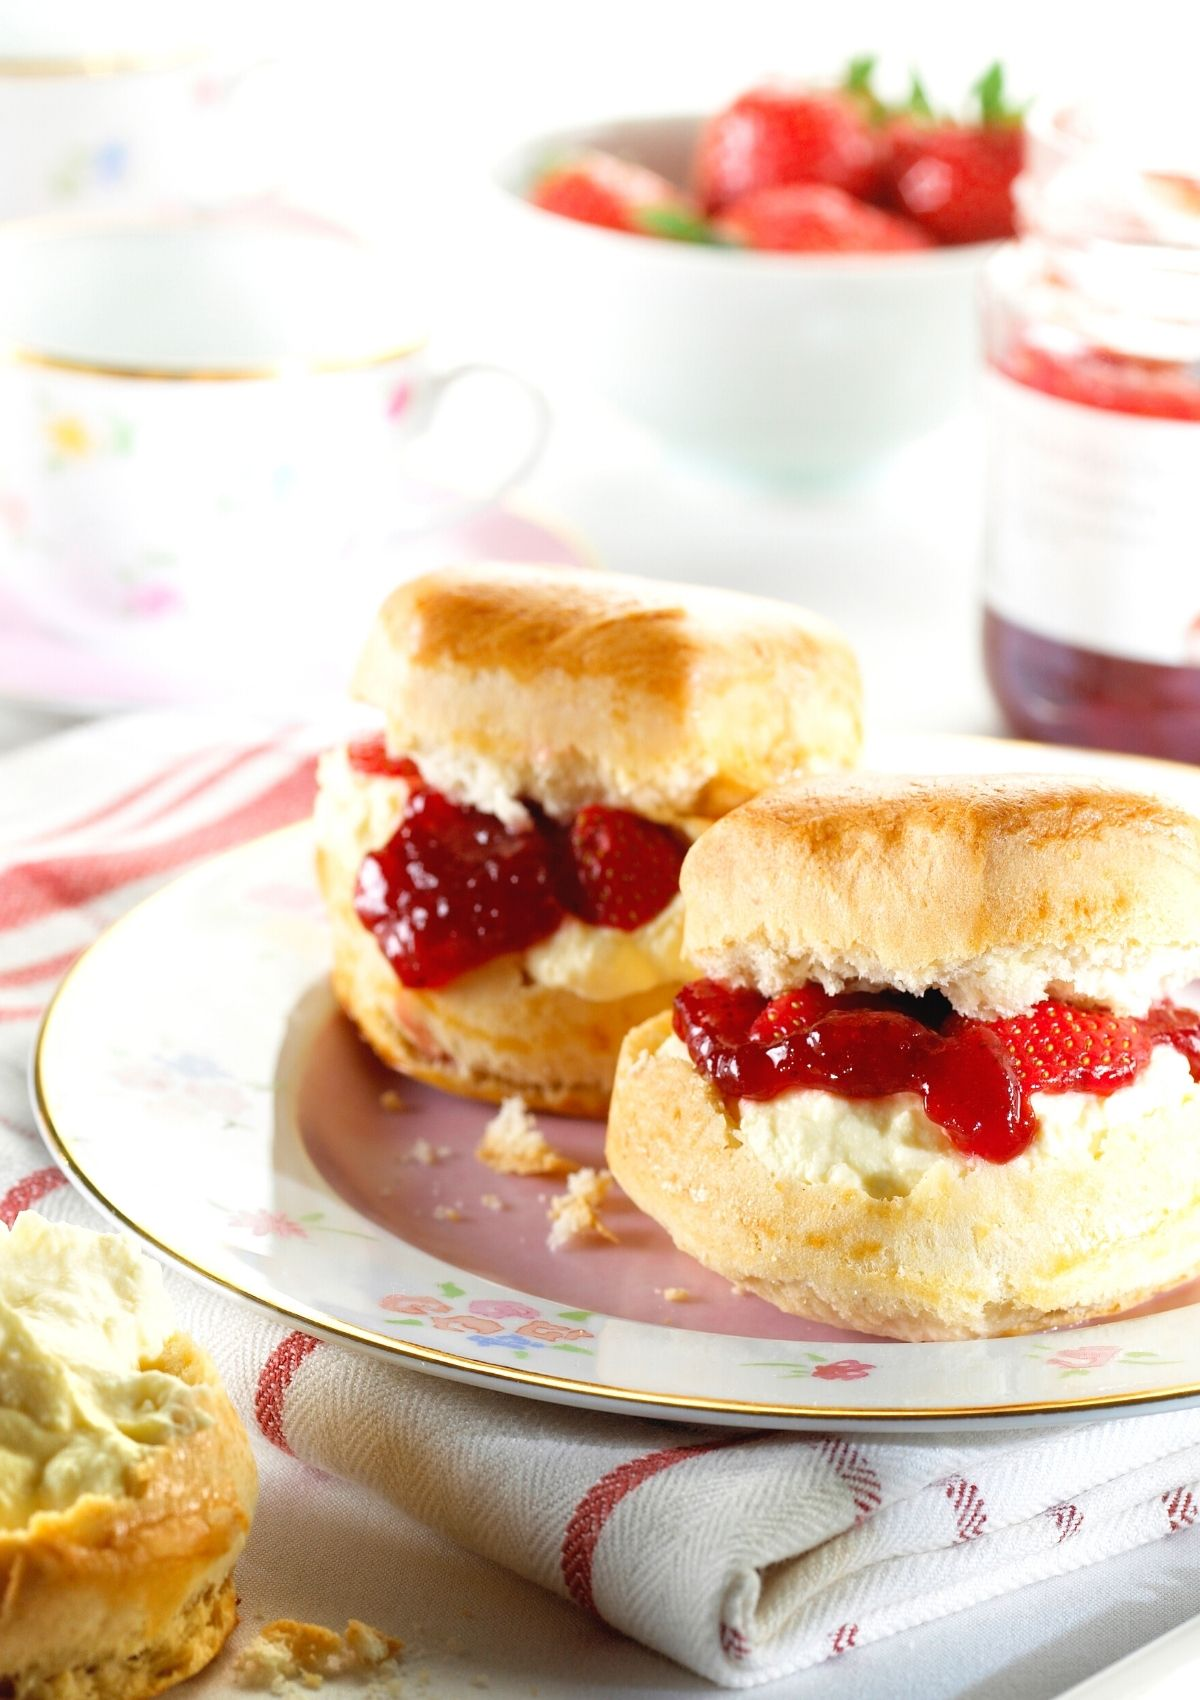 Homemade scones with cream and strawberry jam.